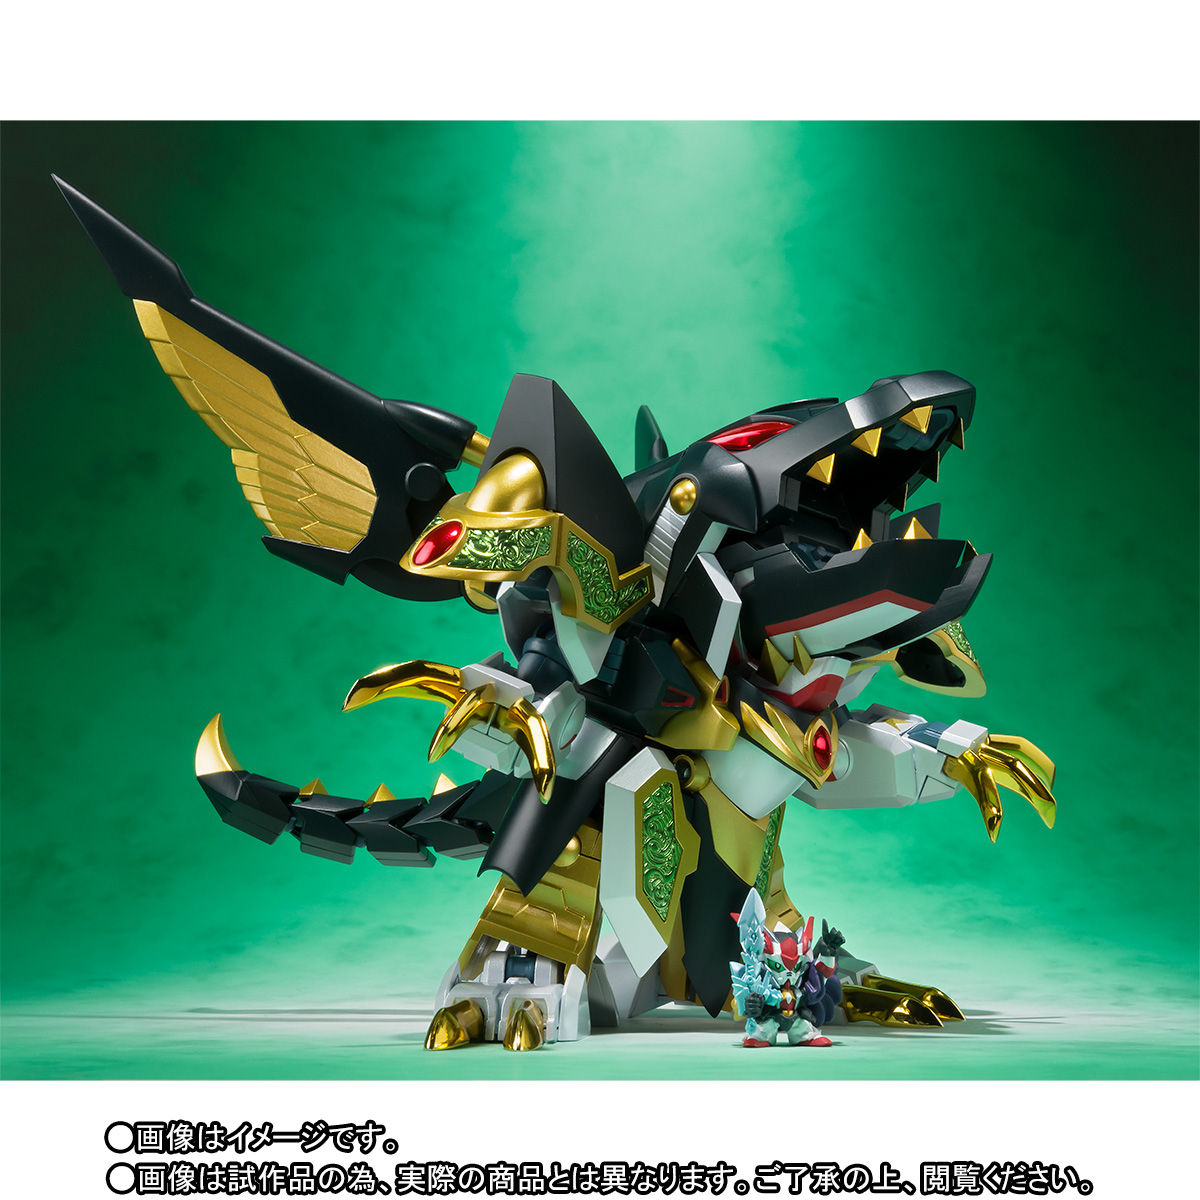 SDX『龍機ドラグーン|新SDガンダム外伝』可変可動フィギュア-006